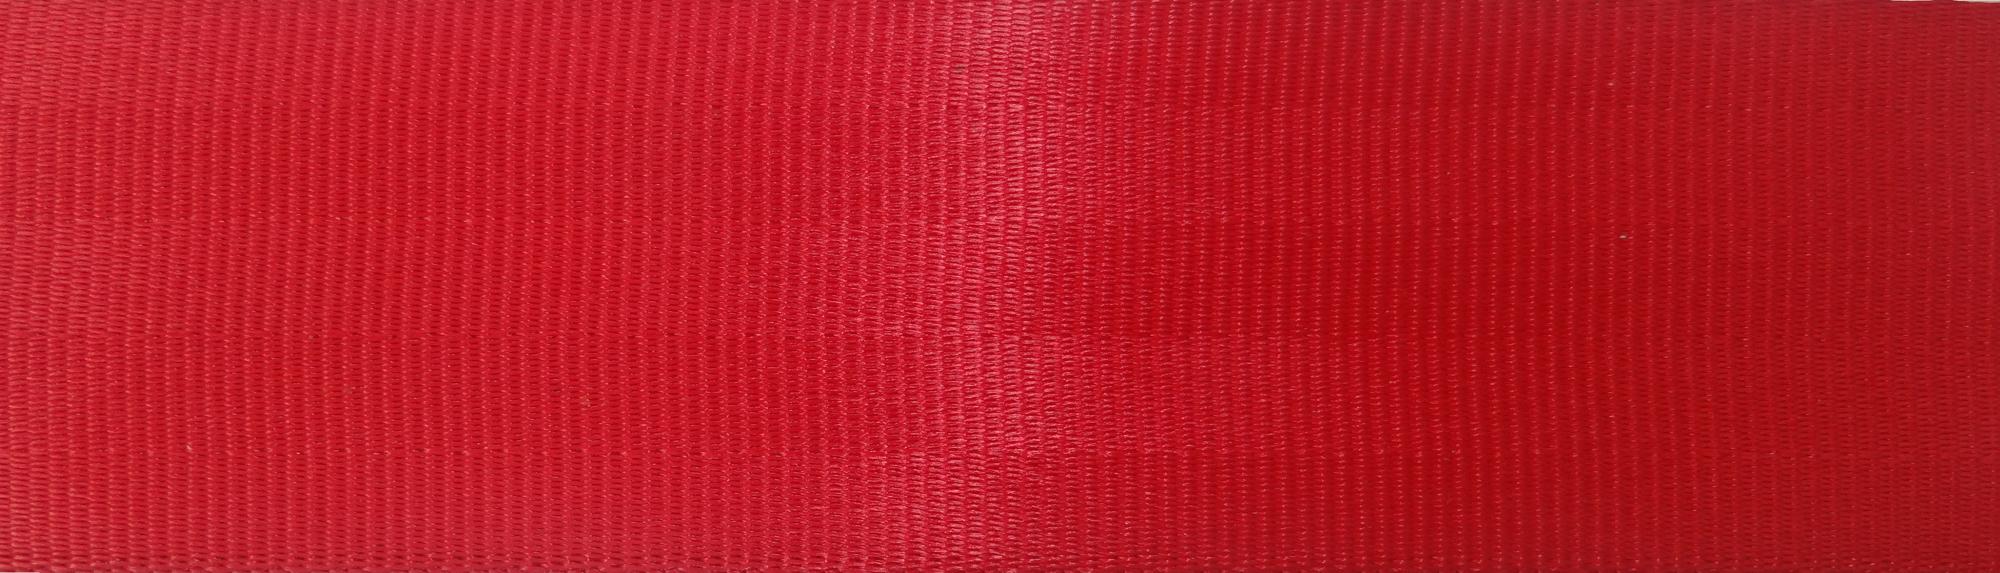 5 Panel Red (Ecotech)